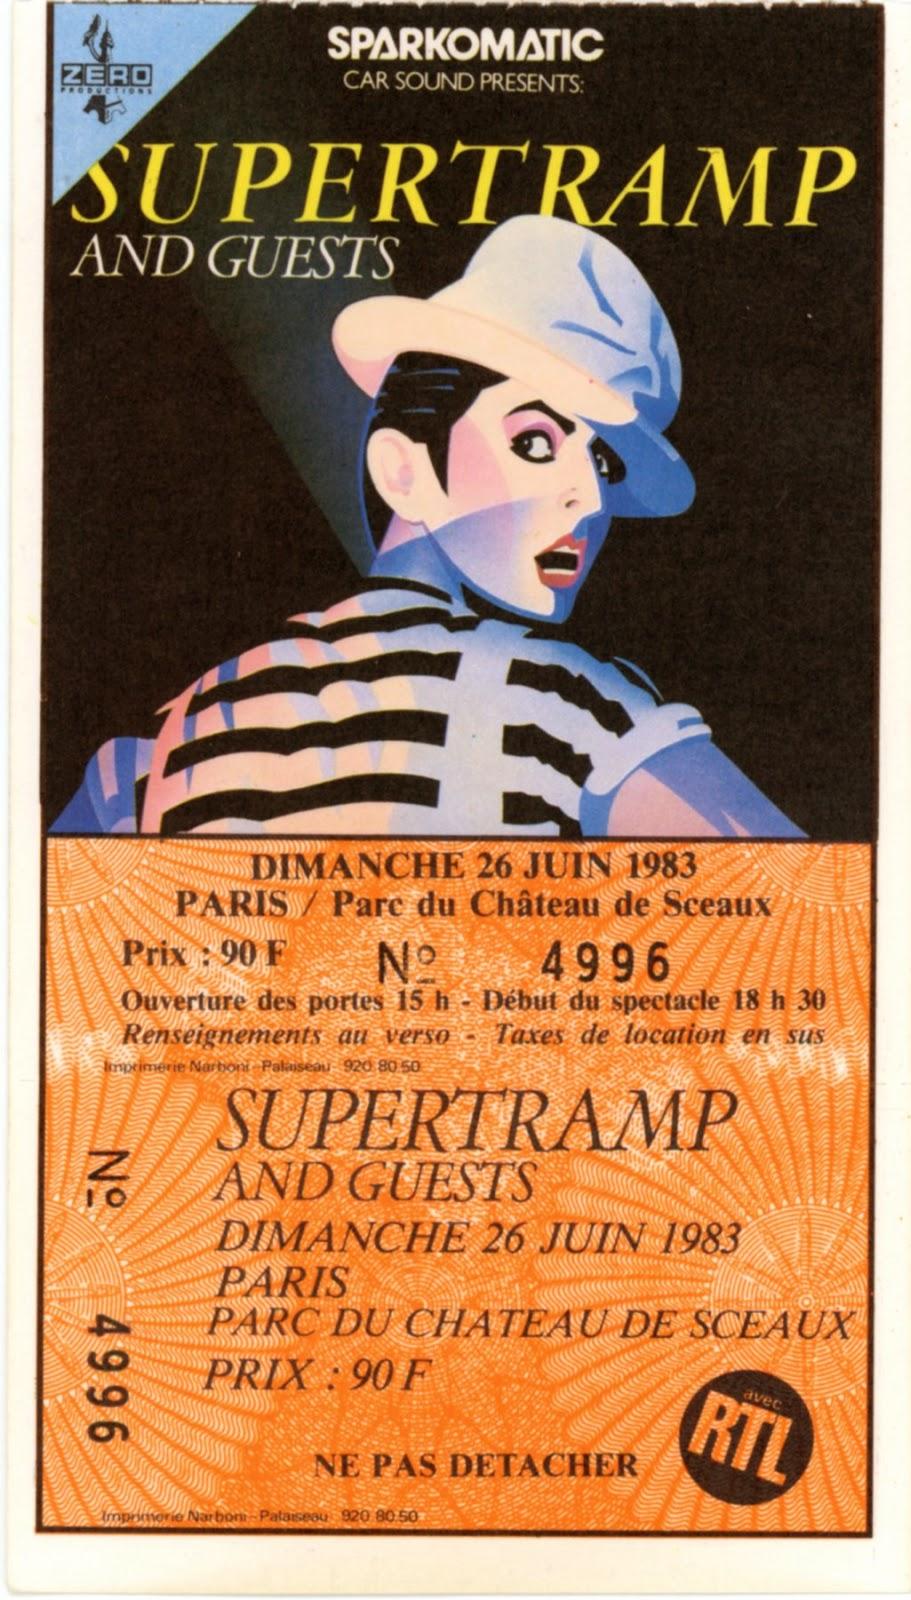 Anciens Billets De Concerts Old Concert Tickets